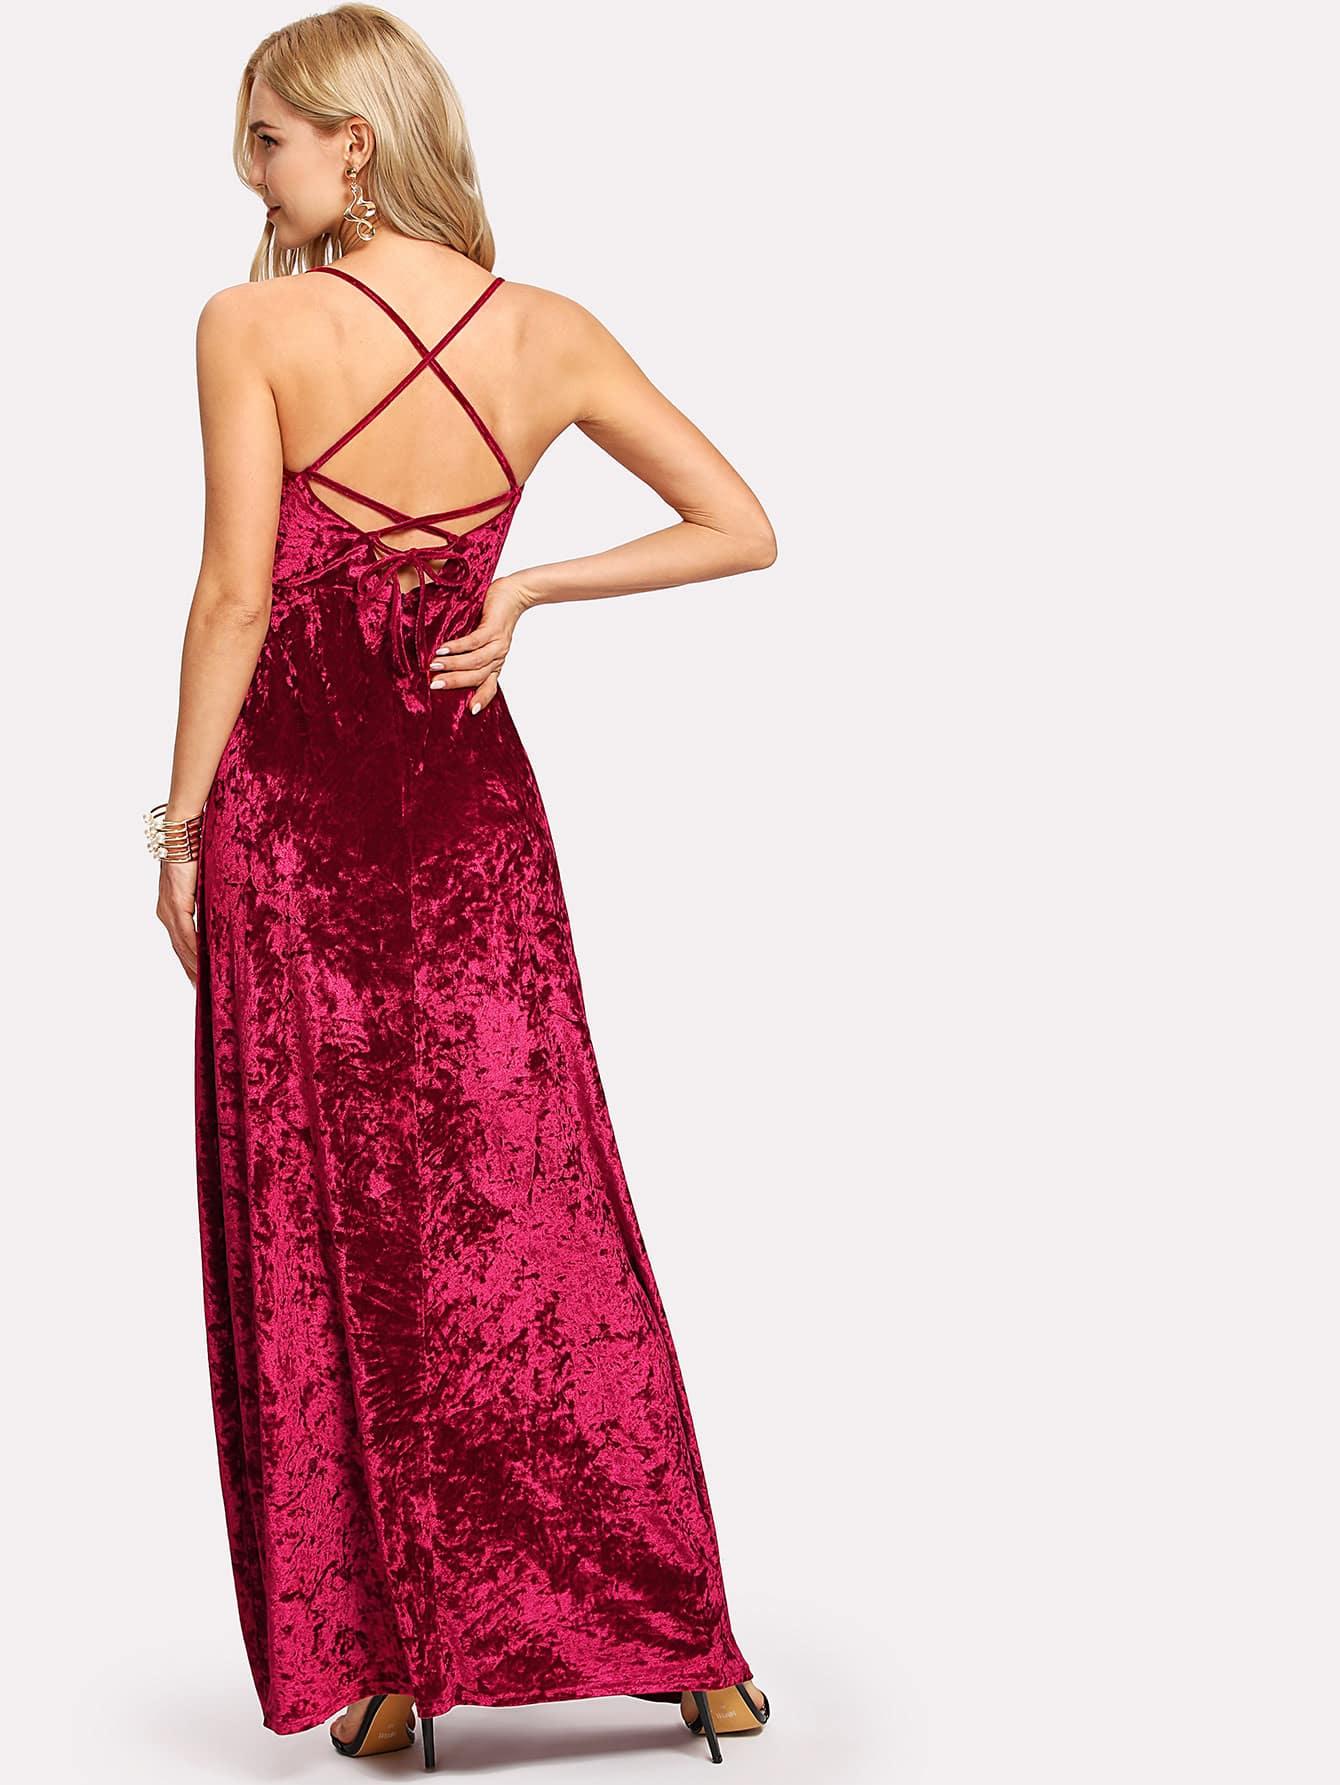 Lace Up Back Crushed Velvet Cami Dress zip up crushed velvet skirt